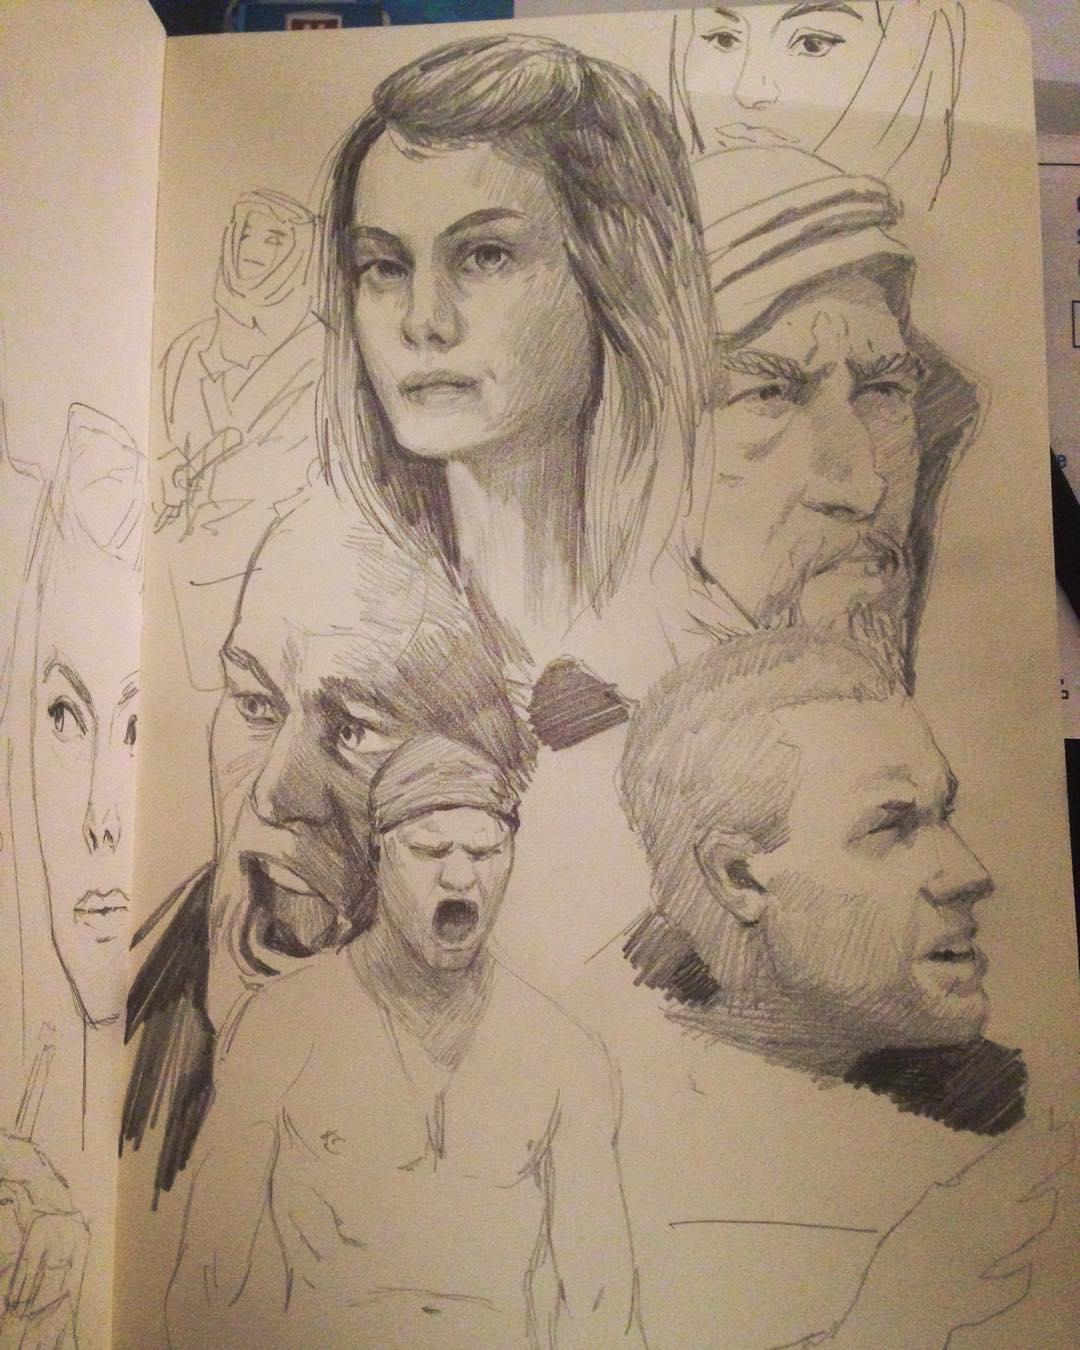 Warmup today #filmstudies #drawing #moleskine #faces #art #astudyaday #jarhead #lawrenceofarabia #ingloriousbasterds